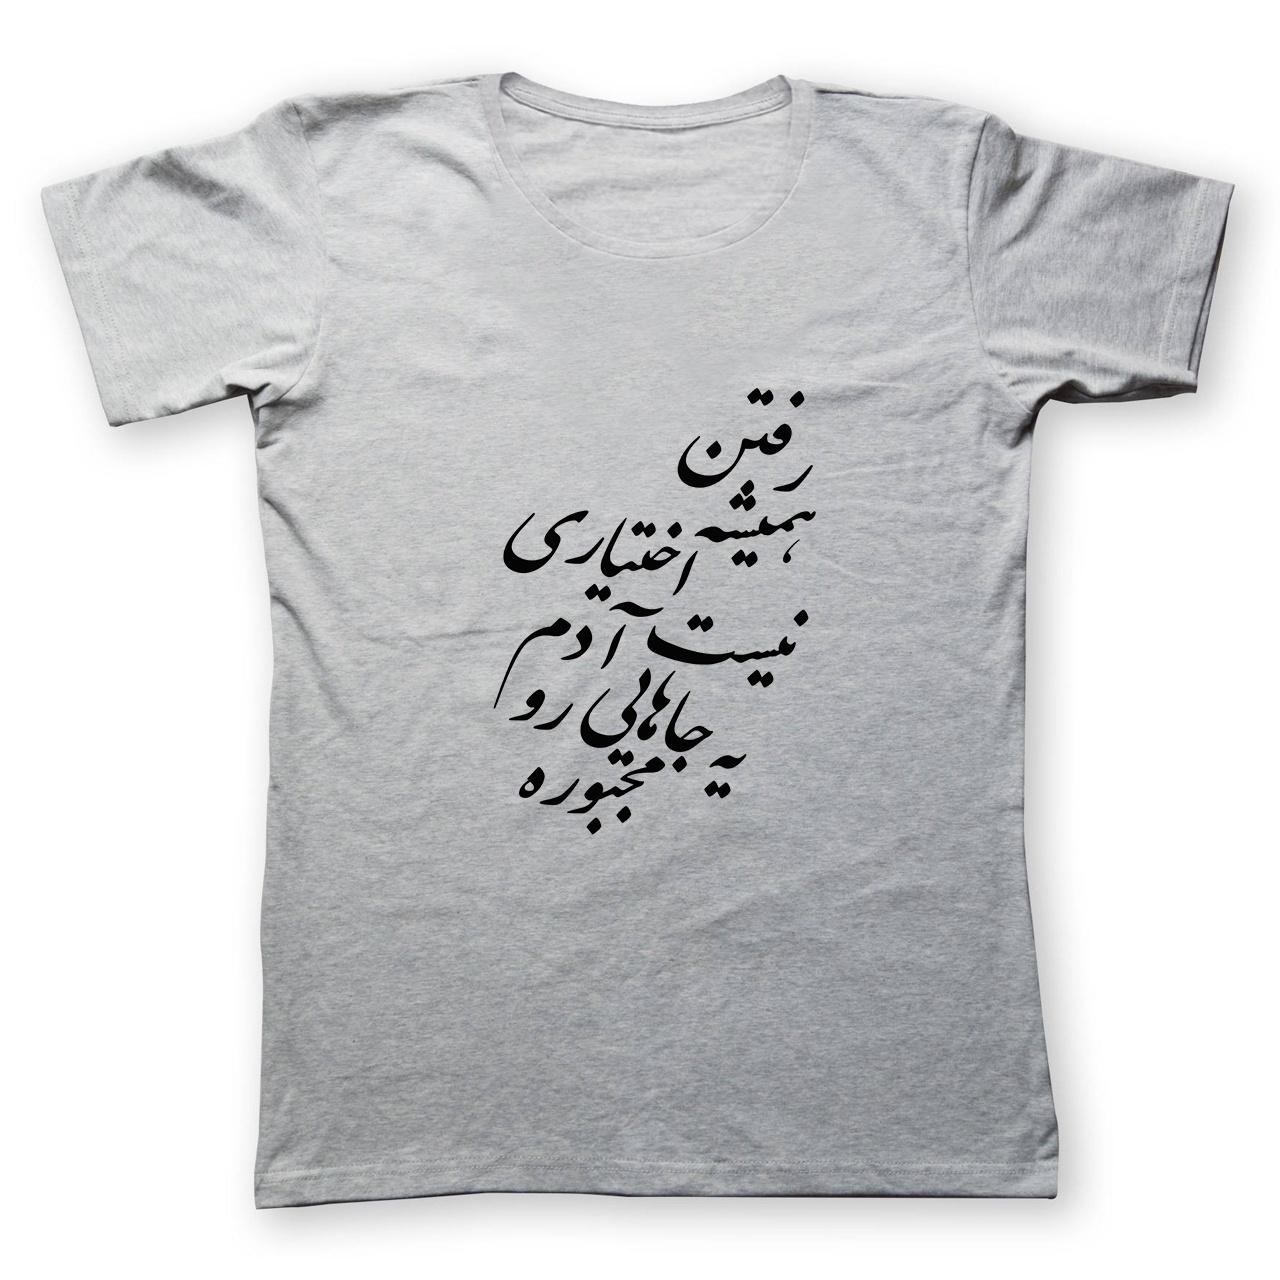 Photo of تی شرت مردانه به رسم طرح رفتن اجباری کد 2241